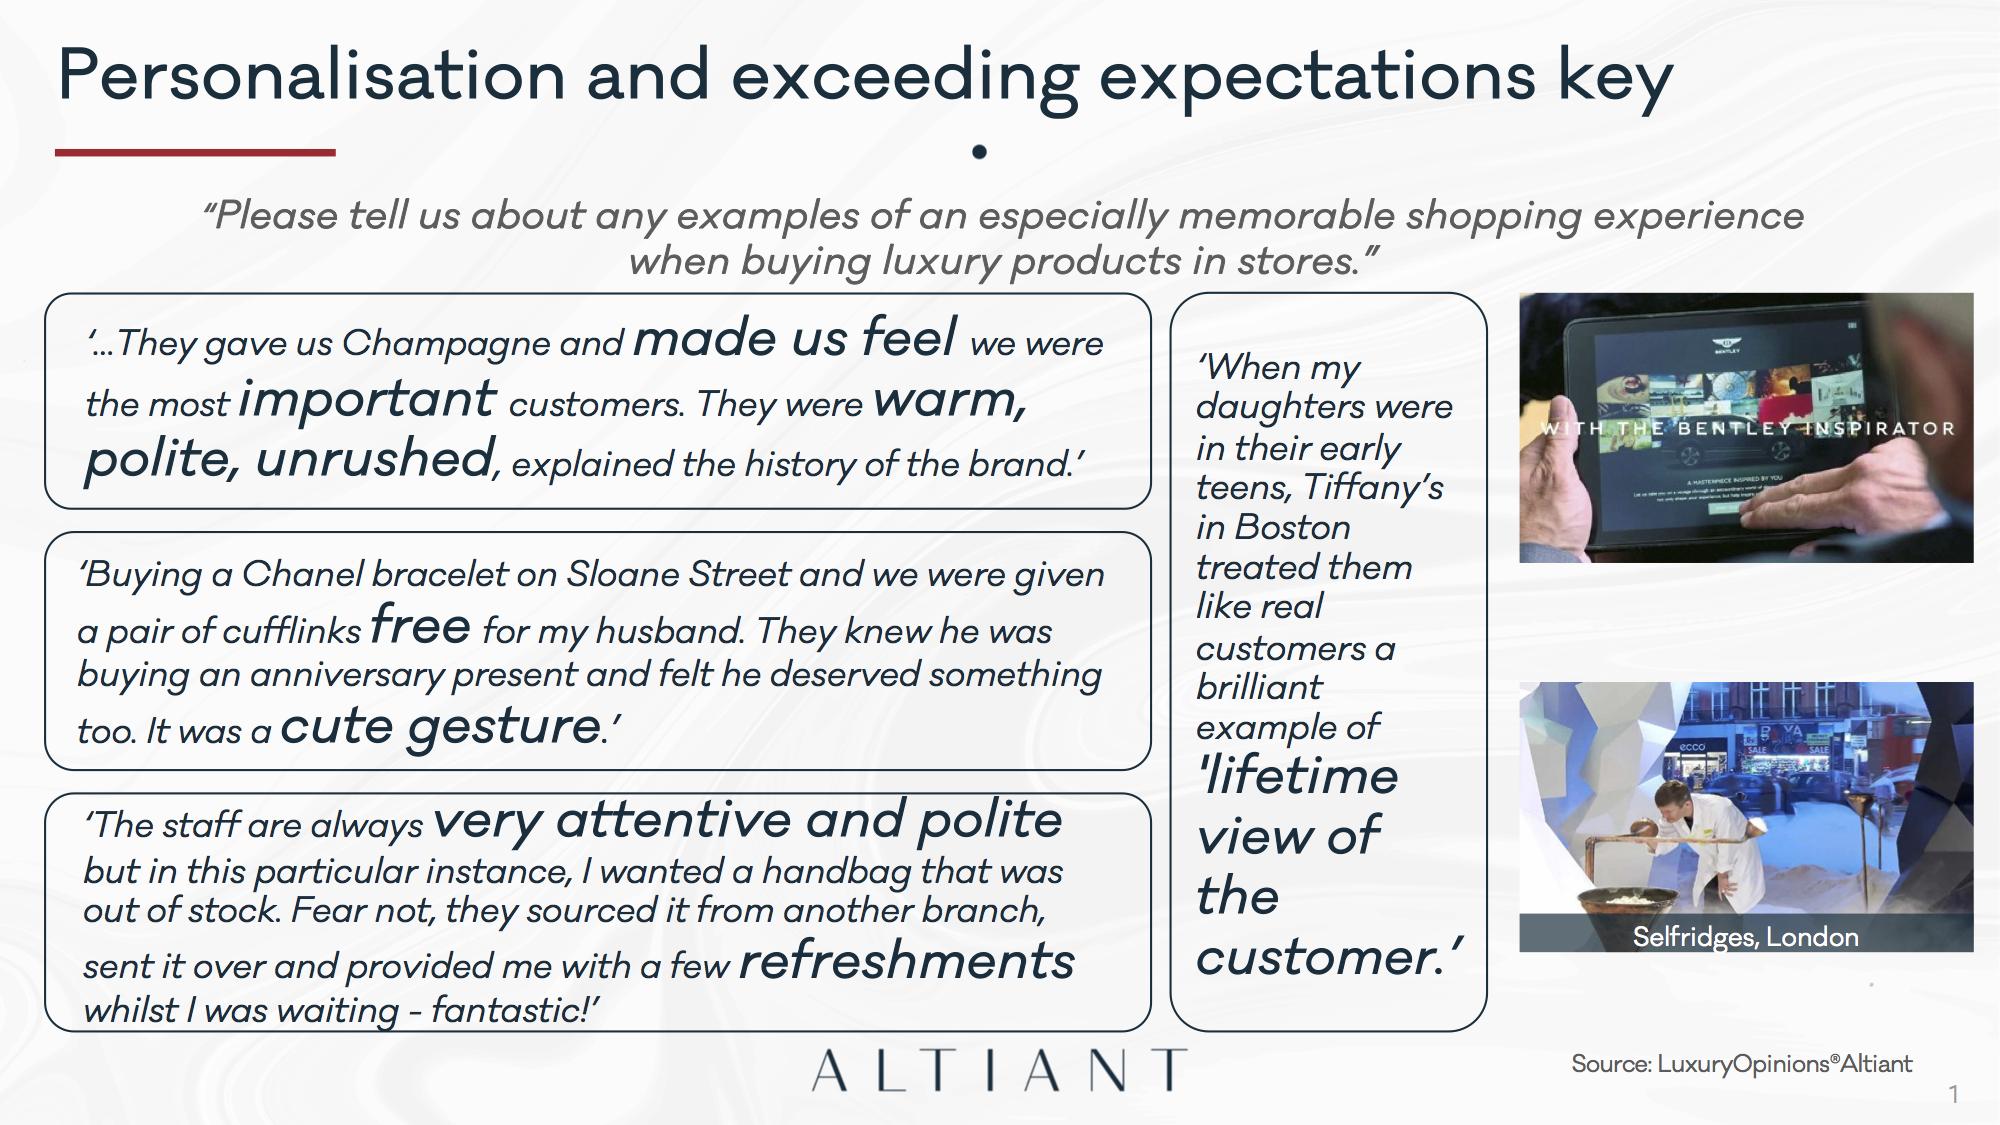 Altiant Key Luxury Trends p13 copy.png